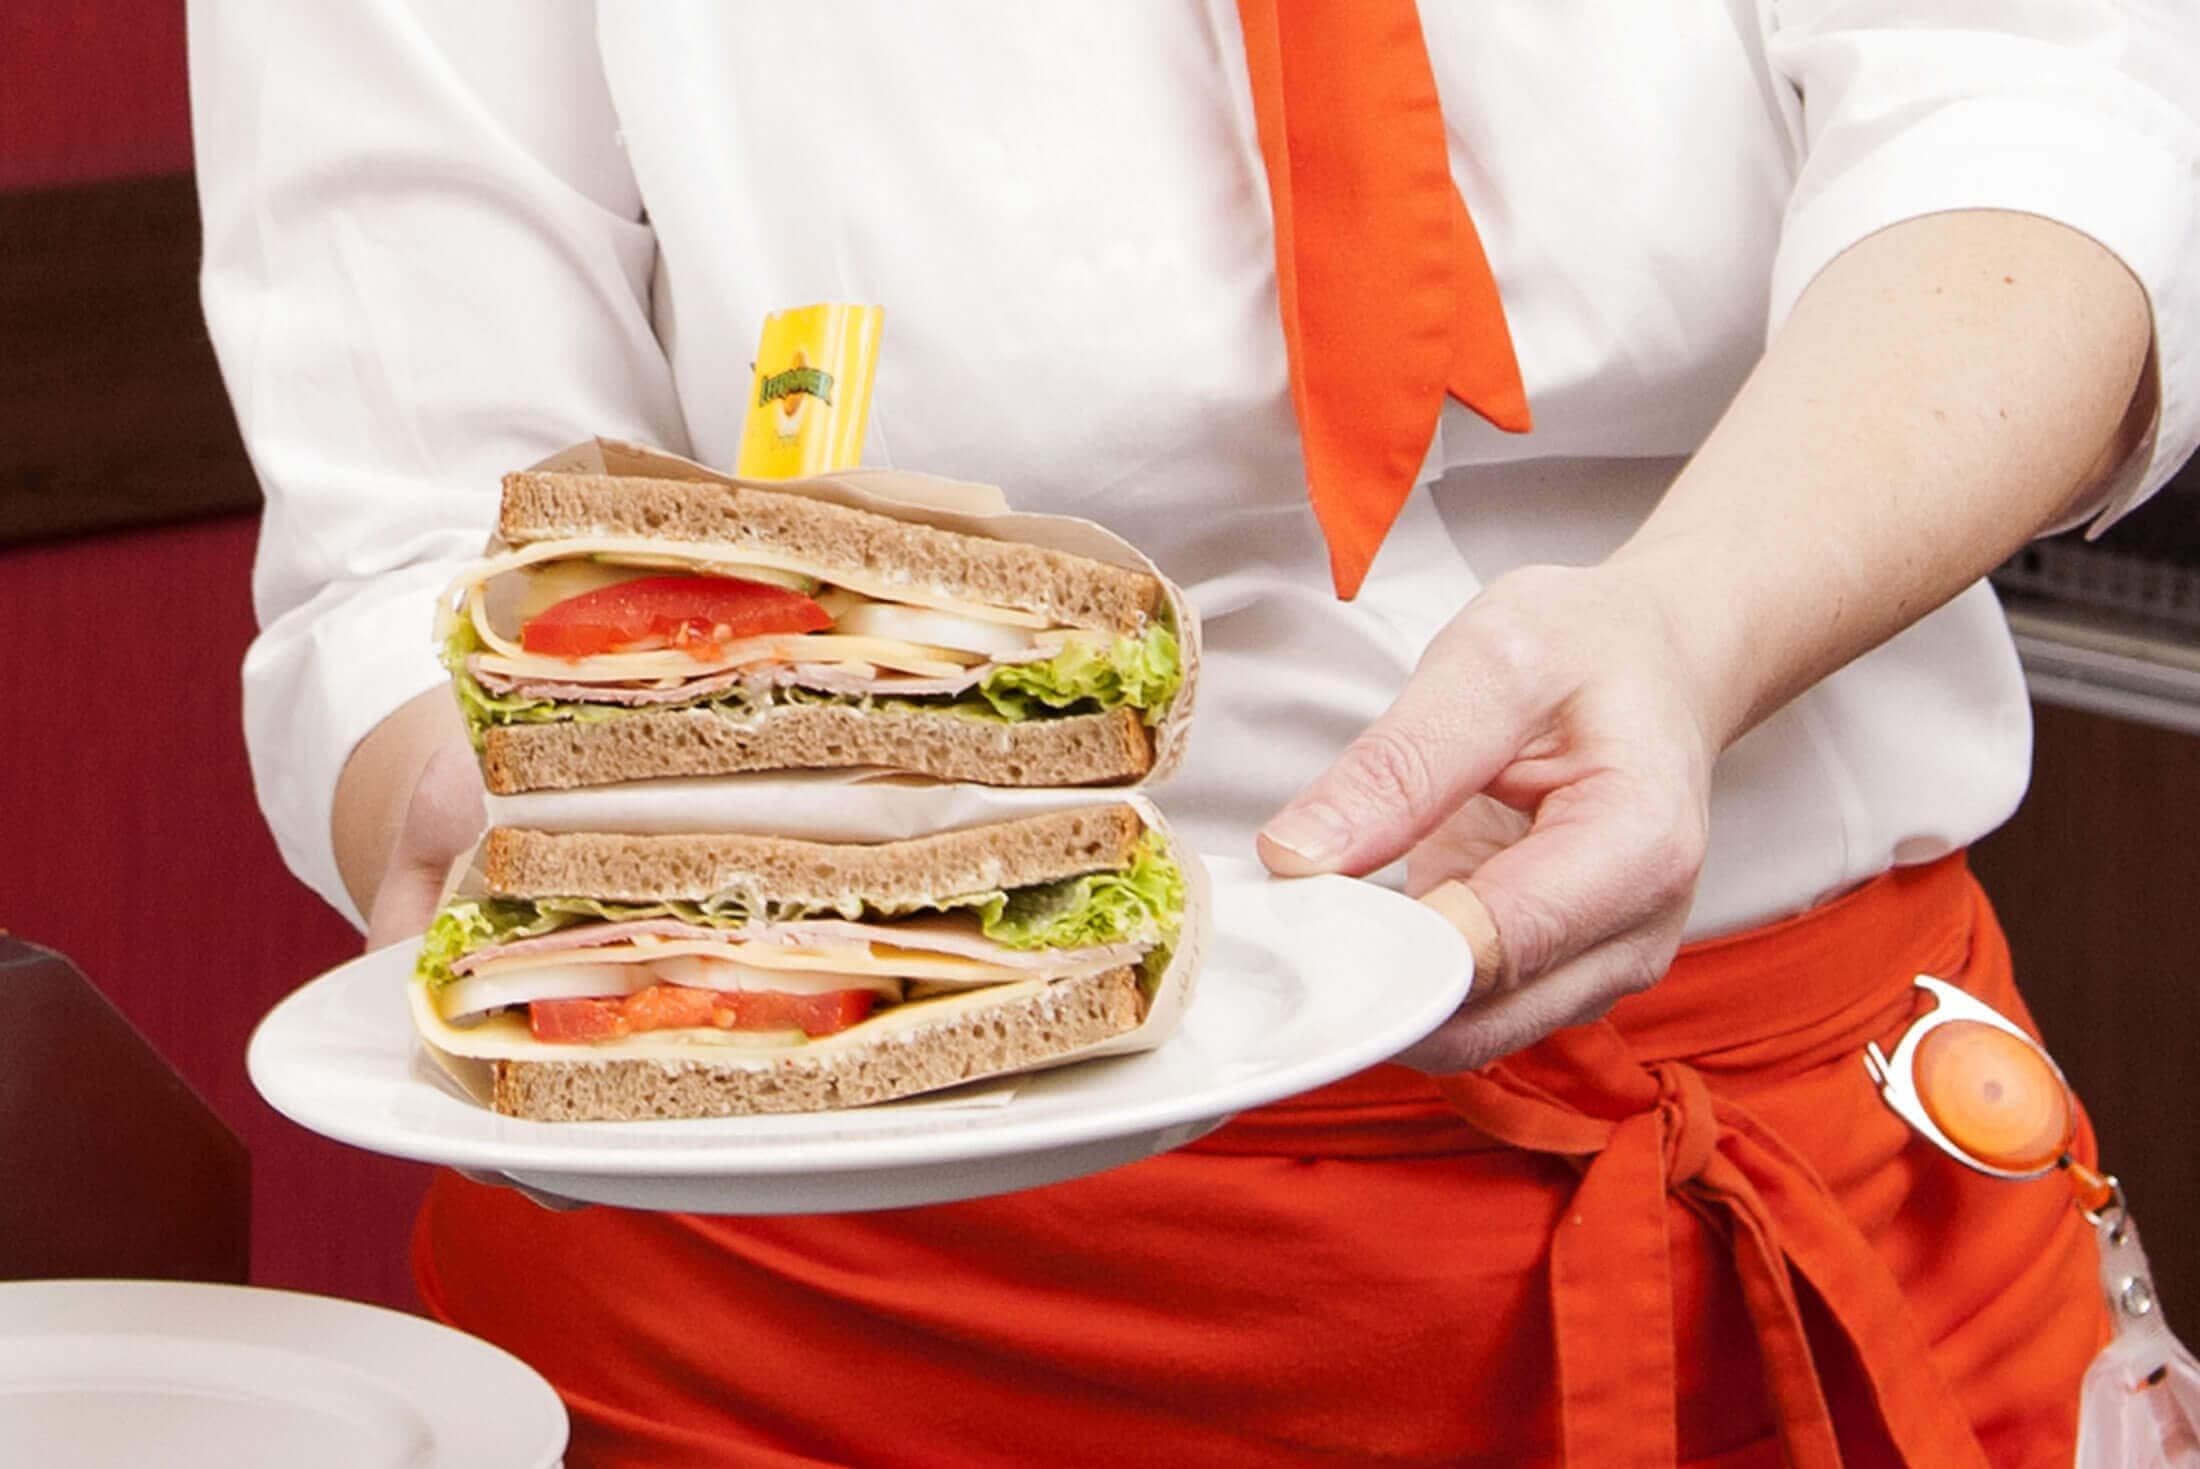 Verkäuferin mit Sandwich